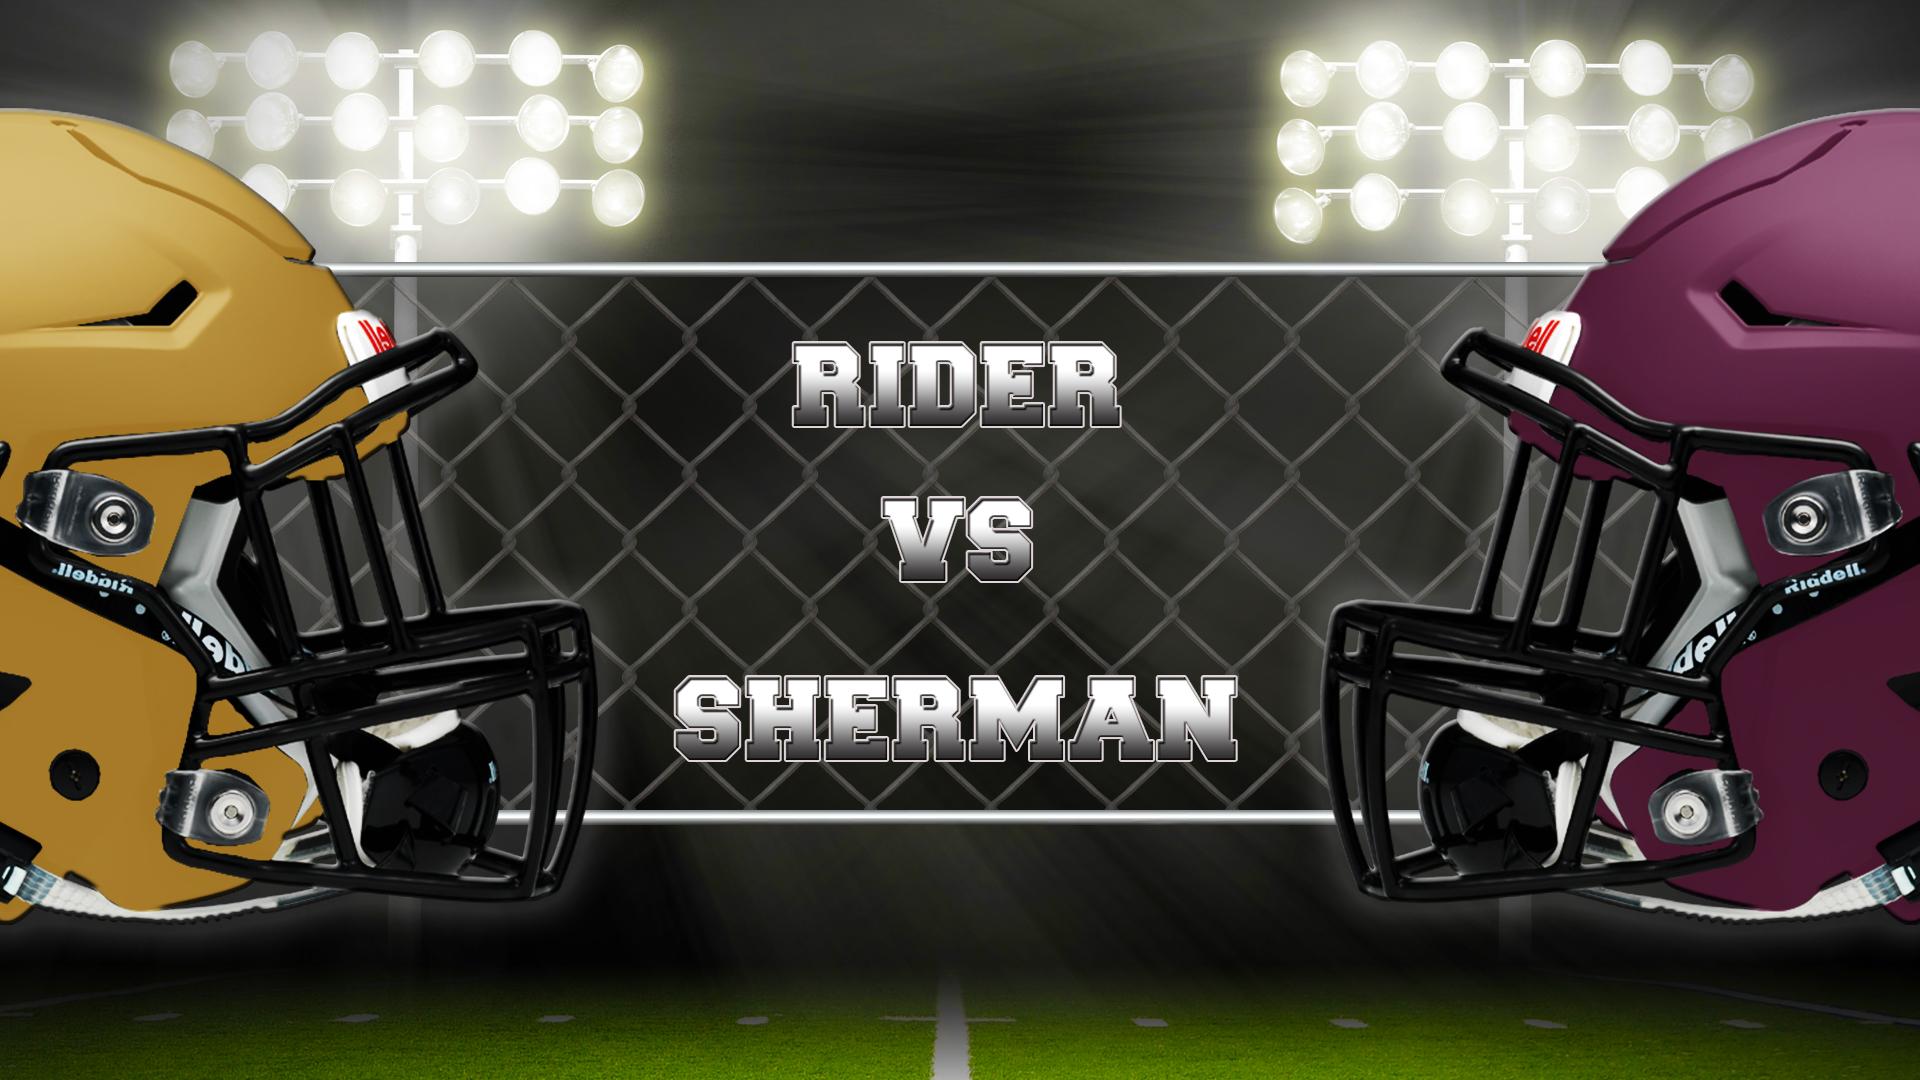 Rider vs Sherman_1474644653891.jpg